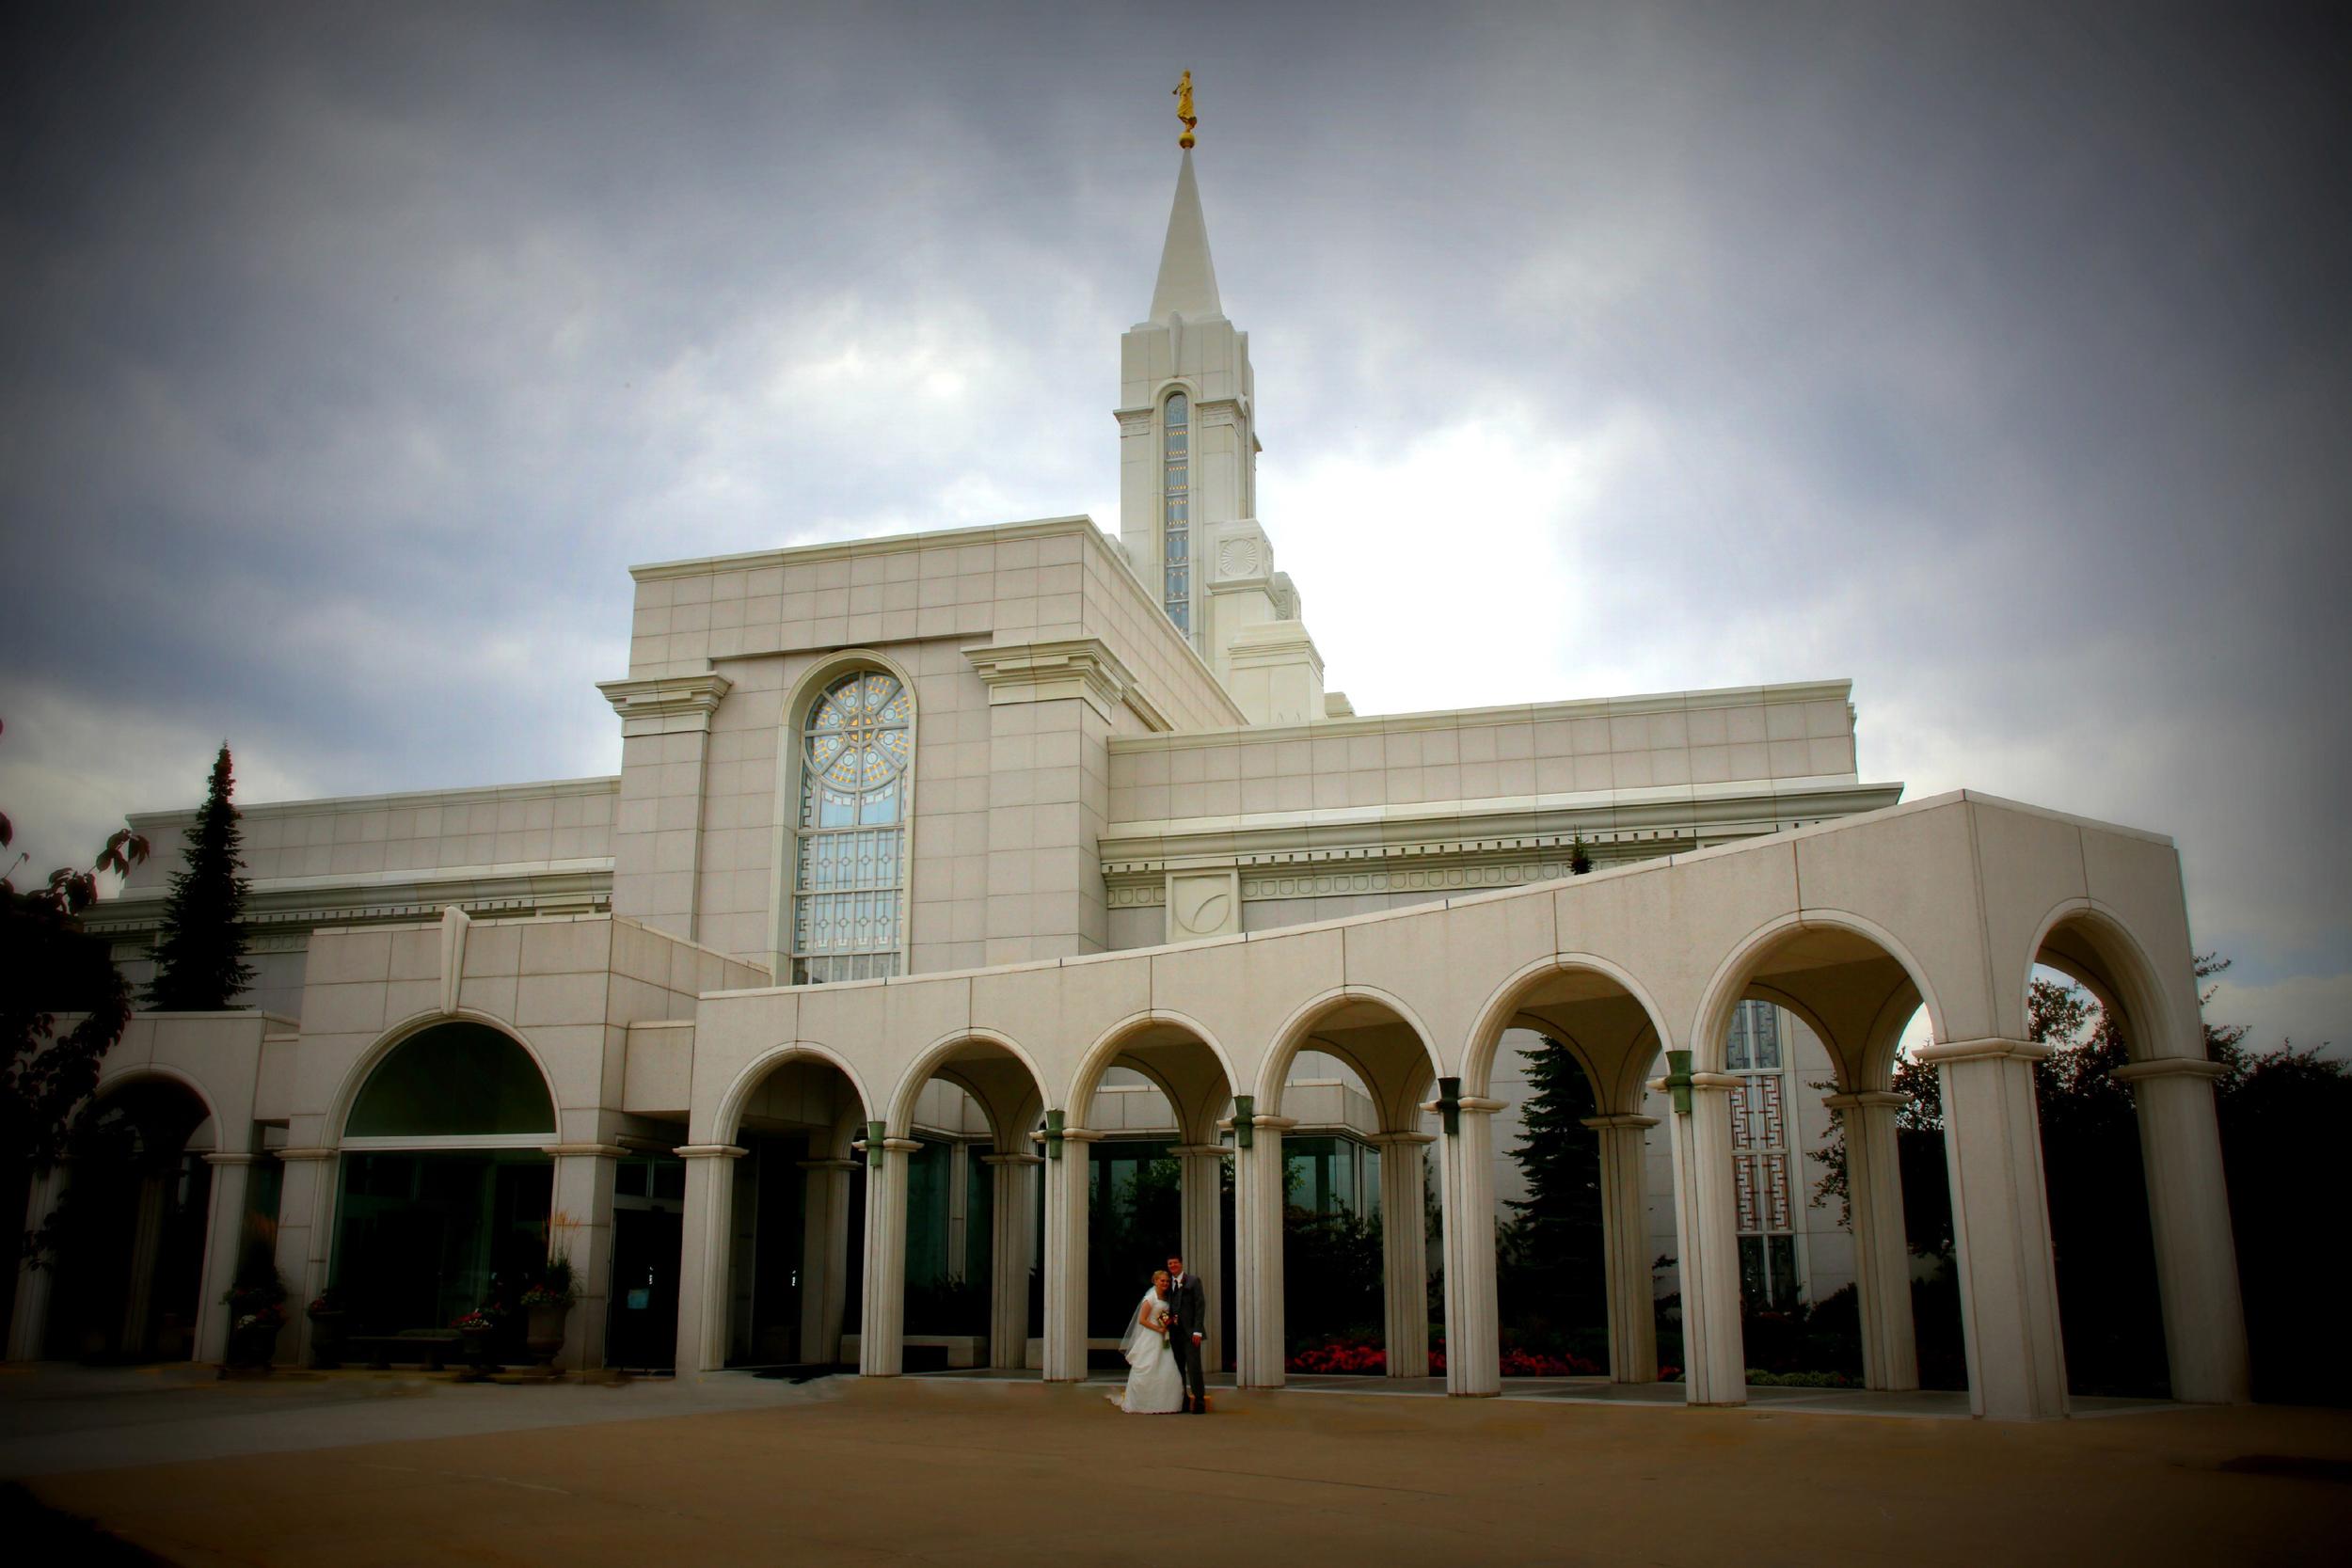 Bountiful Utah LDS Temple wedding Photographer